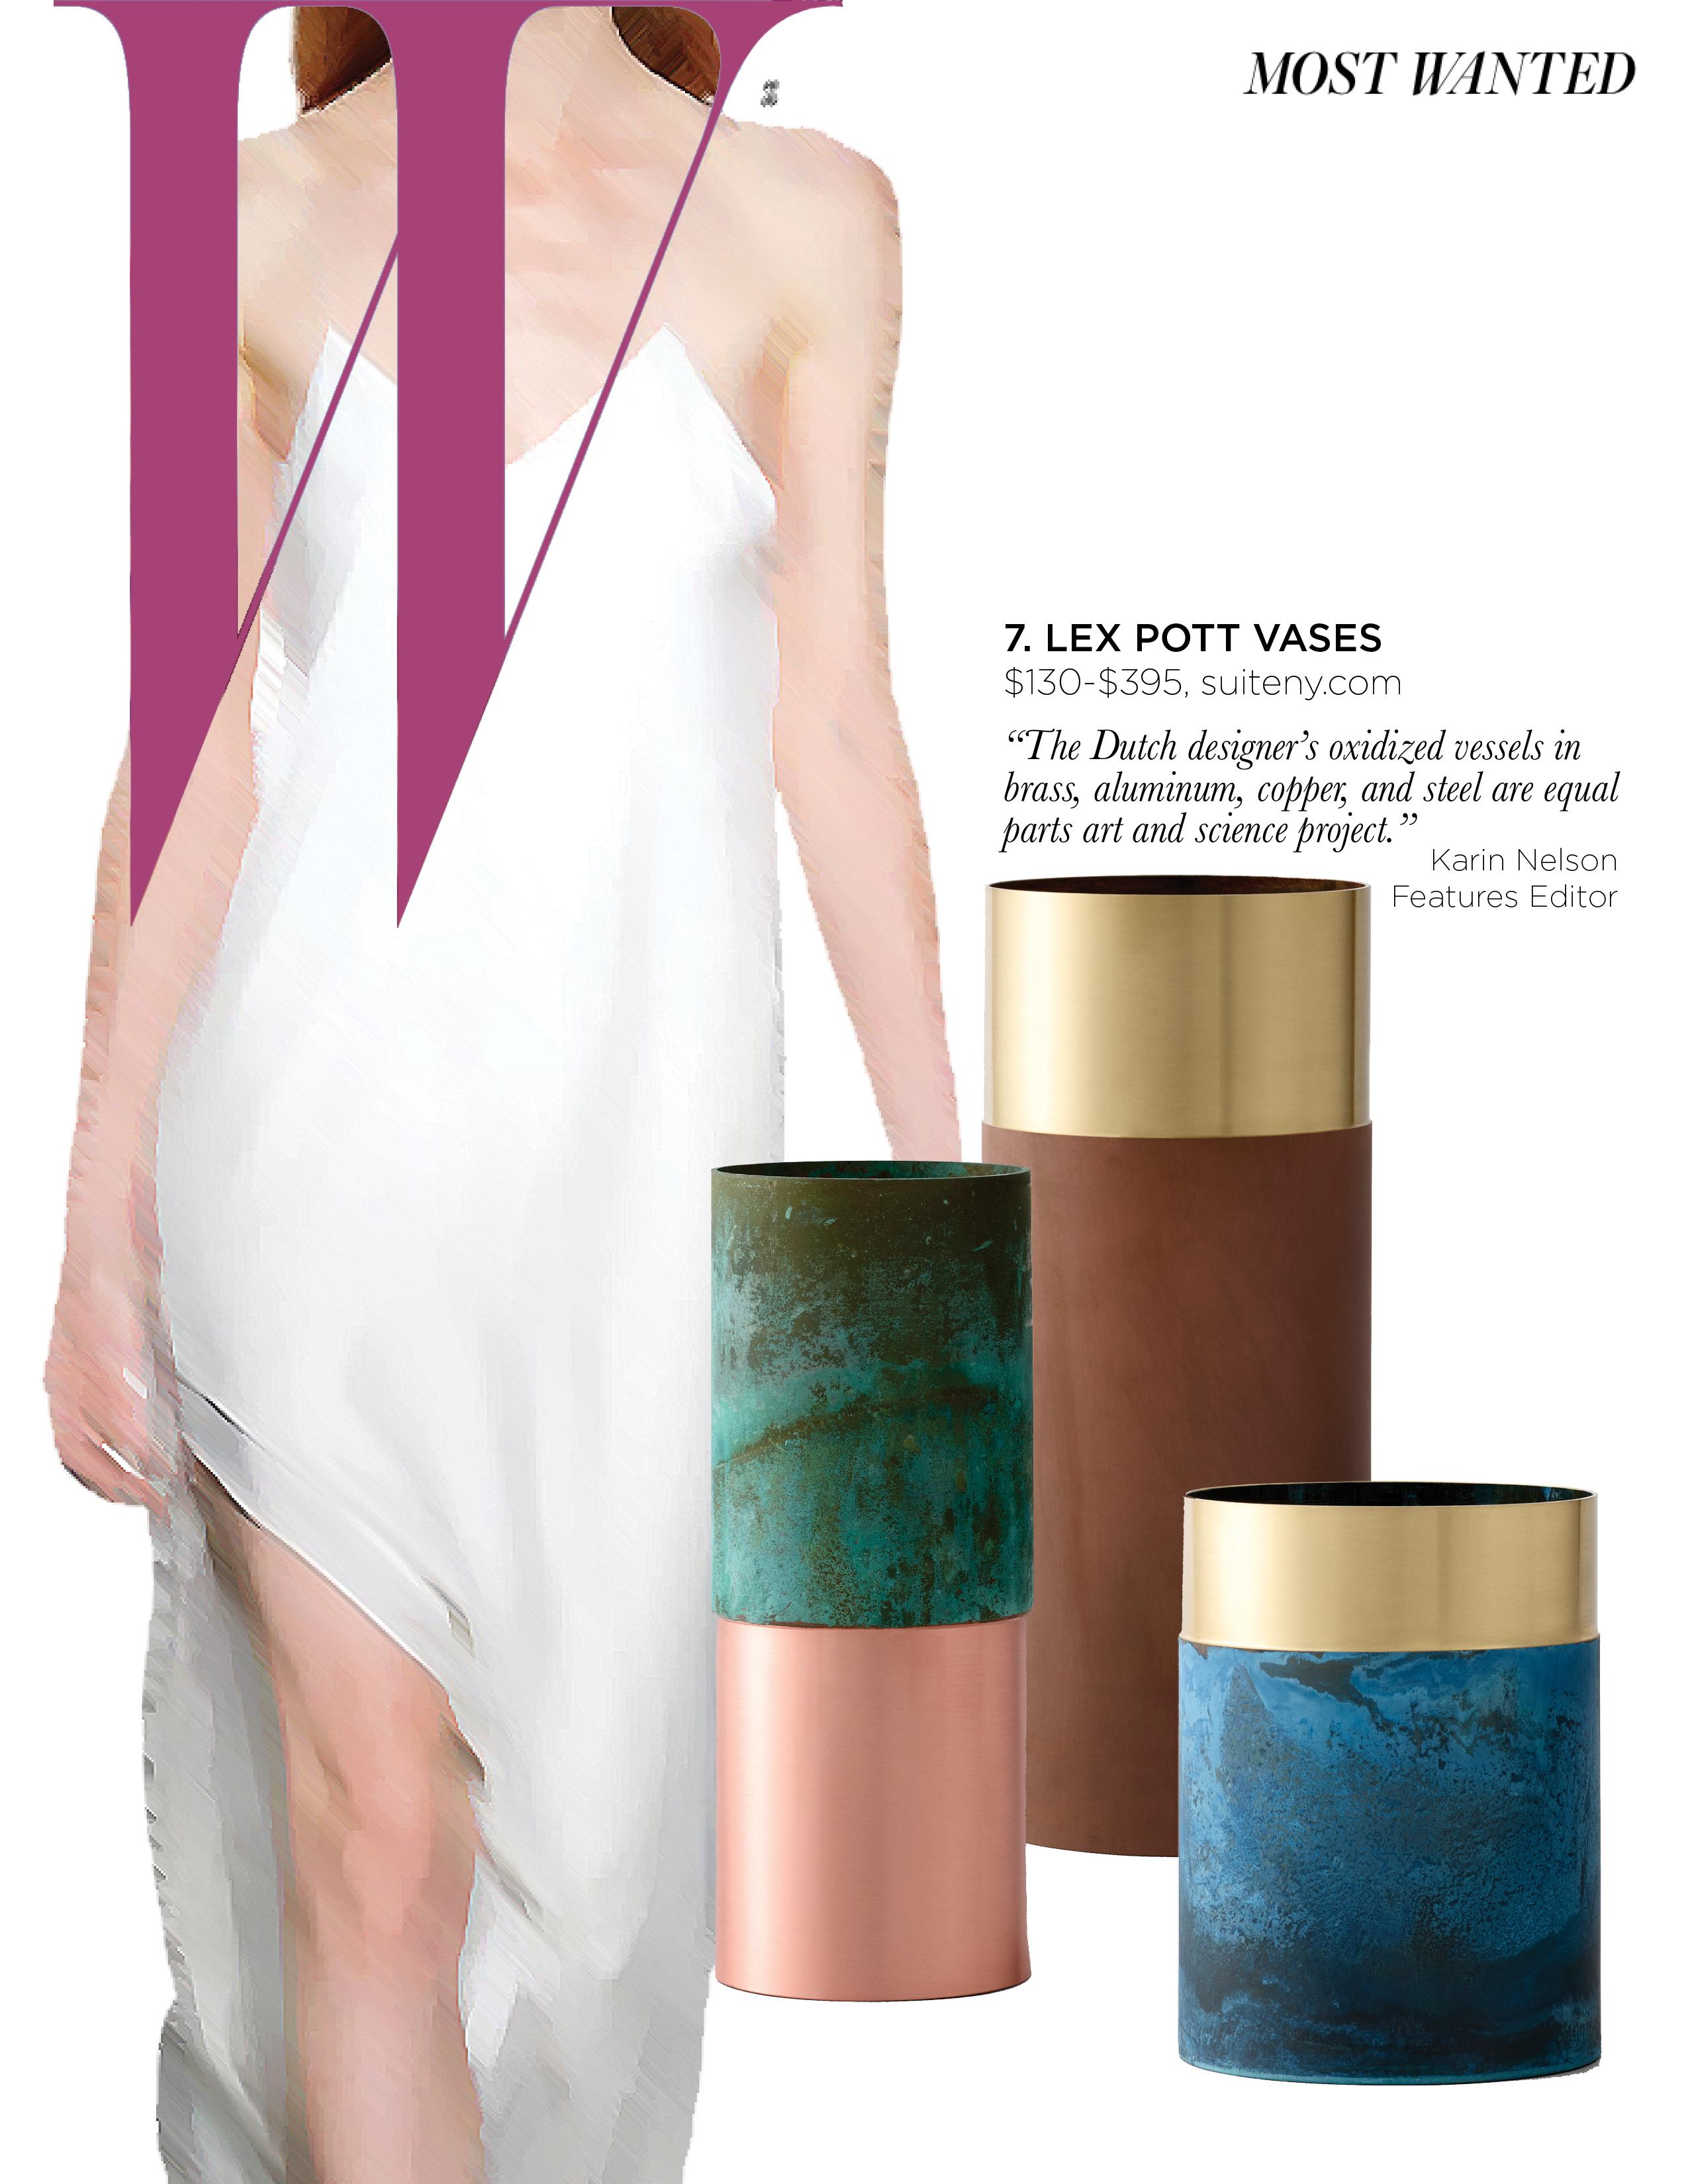 W Magazine True Colour Vases Suite News